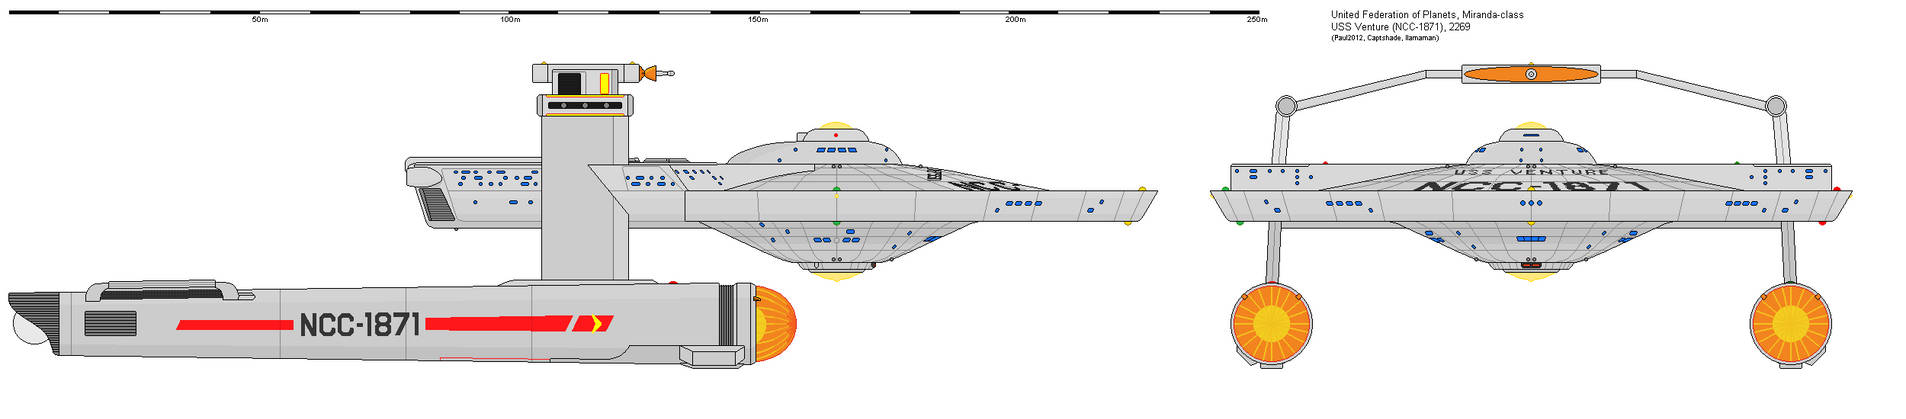 Miranda-class USS Venture, NCC-1871